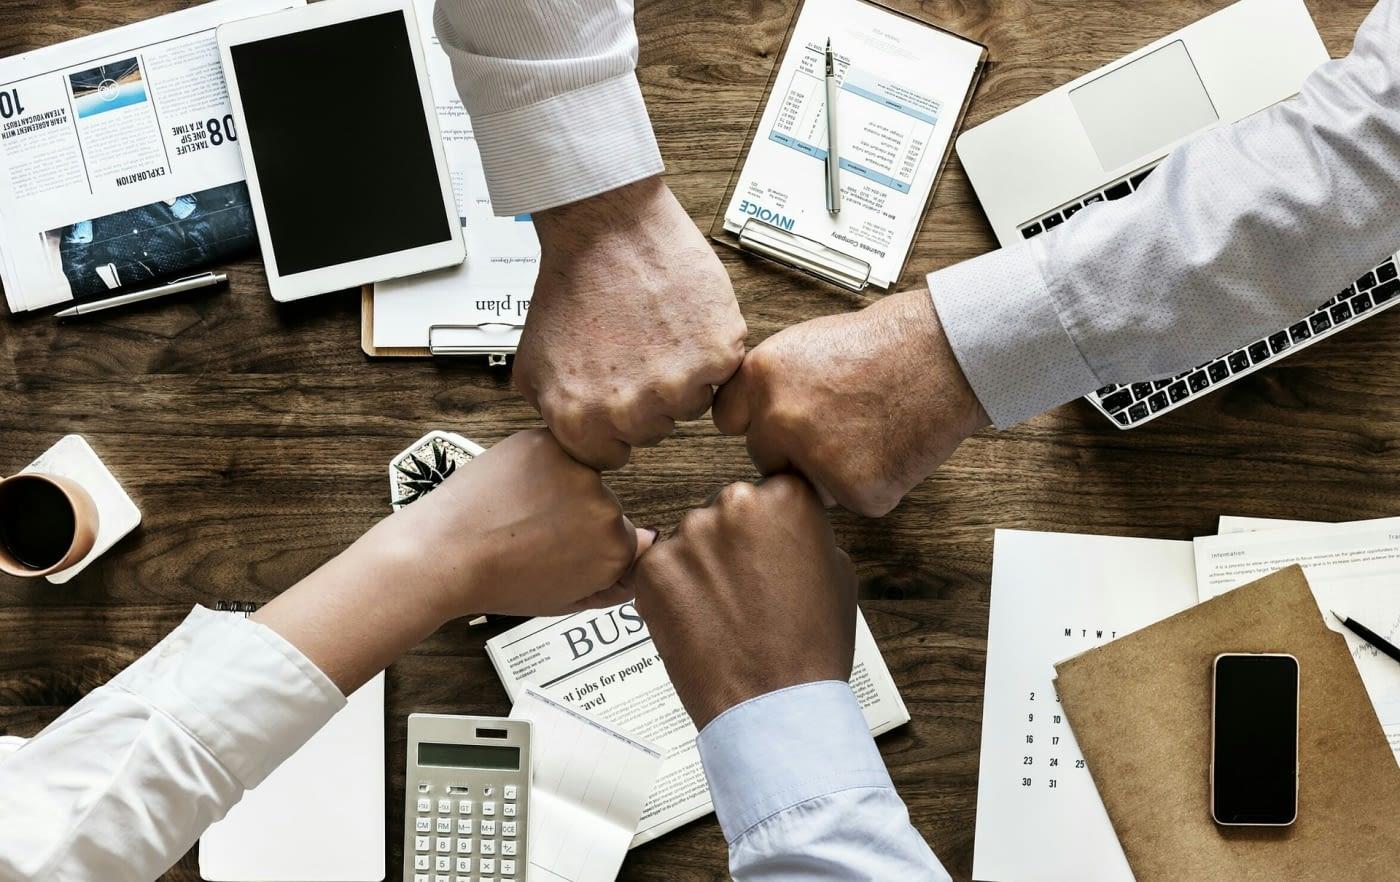 Organización en equipo